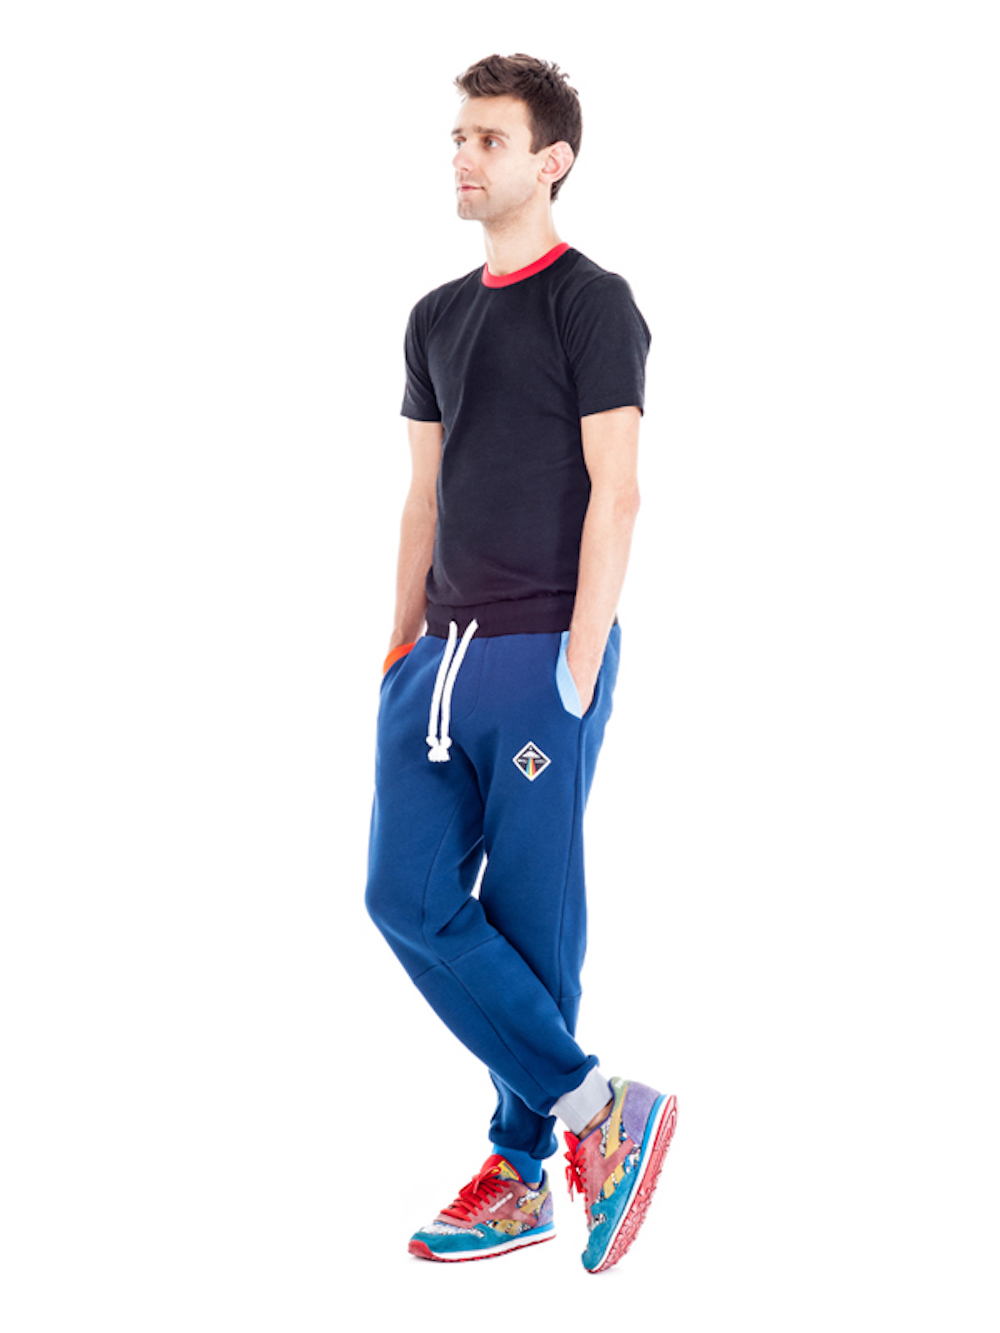 Serpens Sweatpants (Blue) - Okuaku